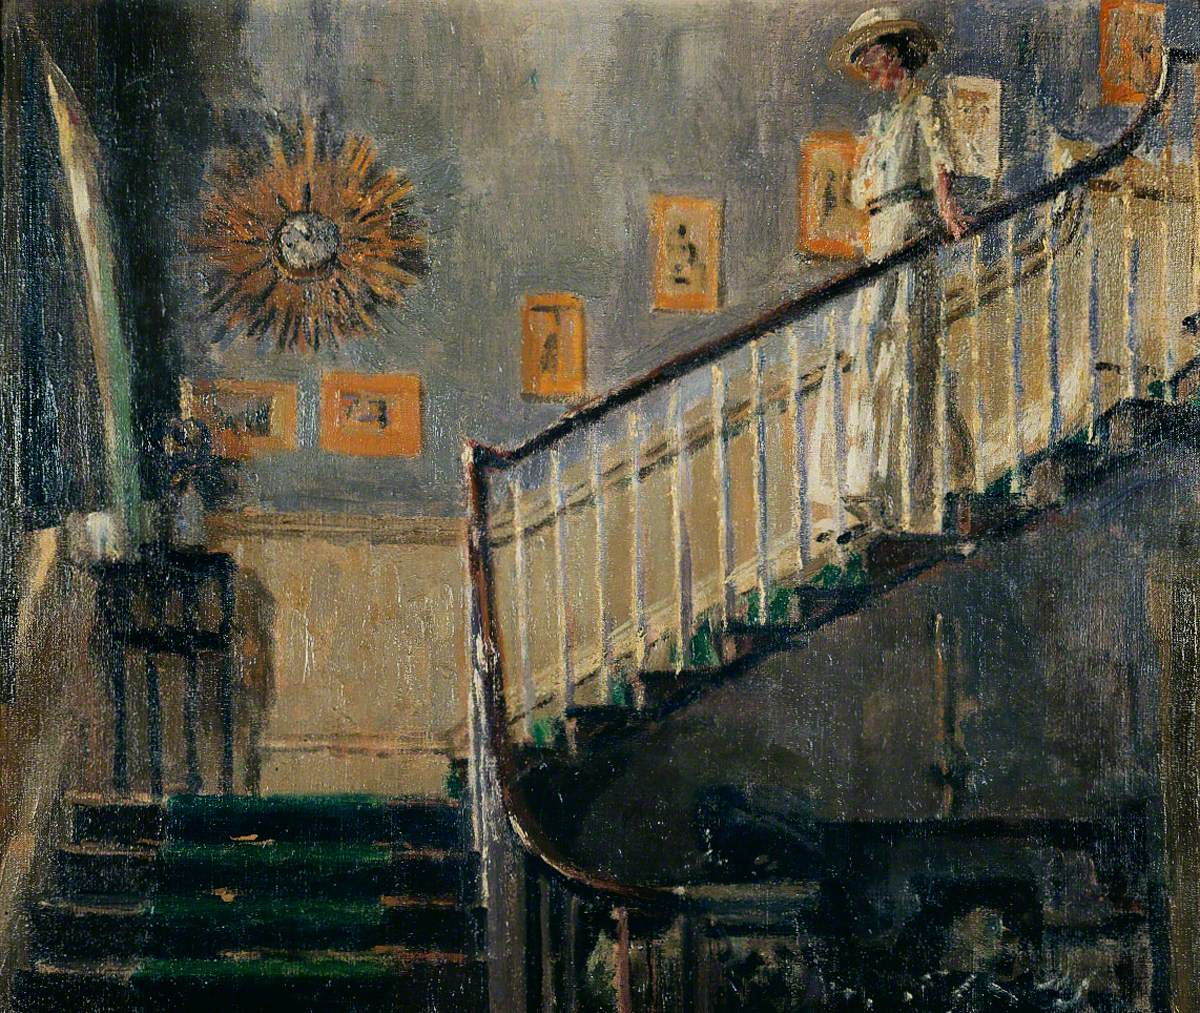 Ethel Sands Descending the Staircase at Newington